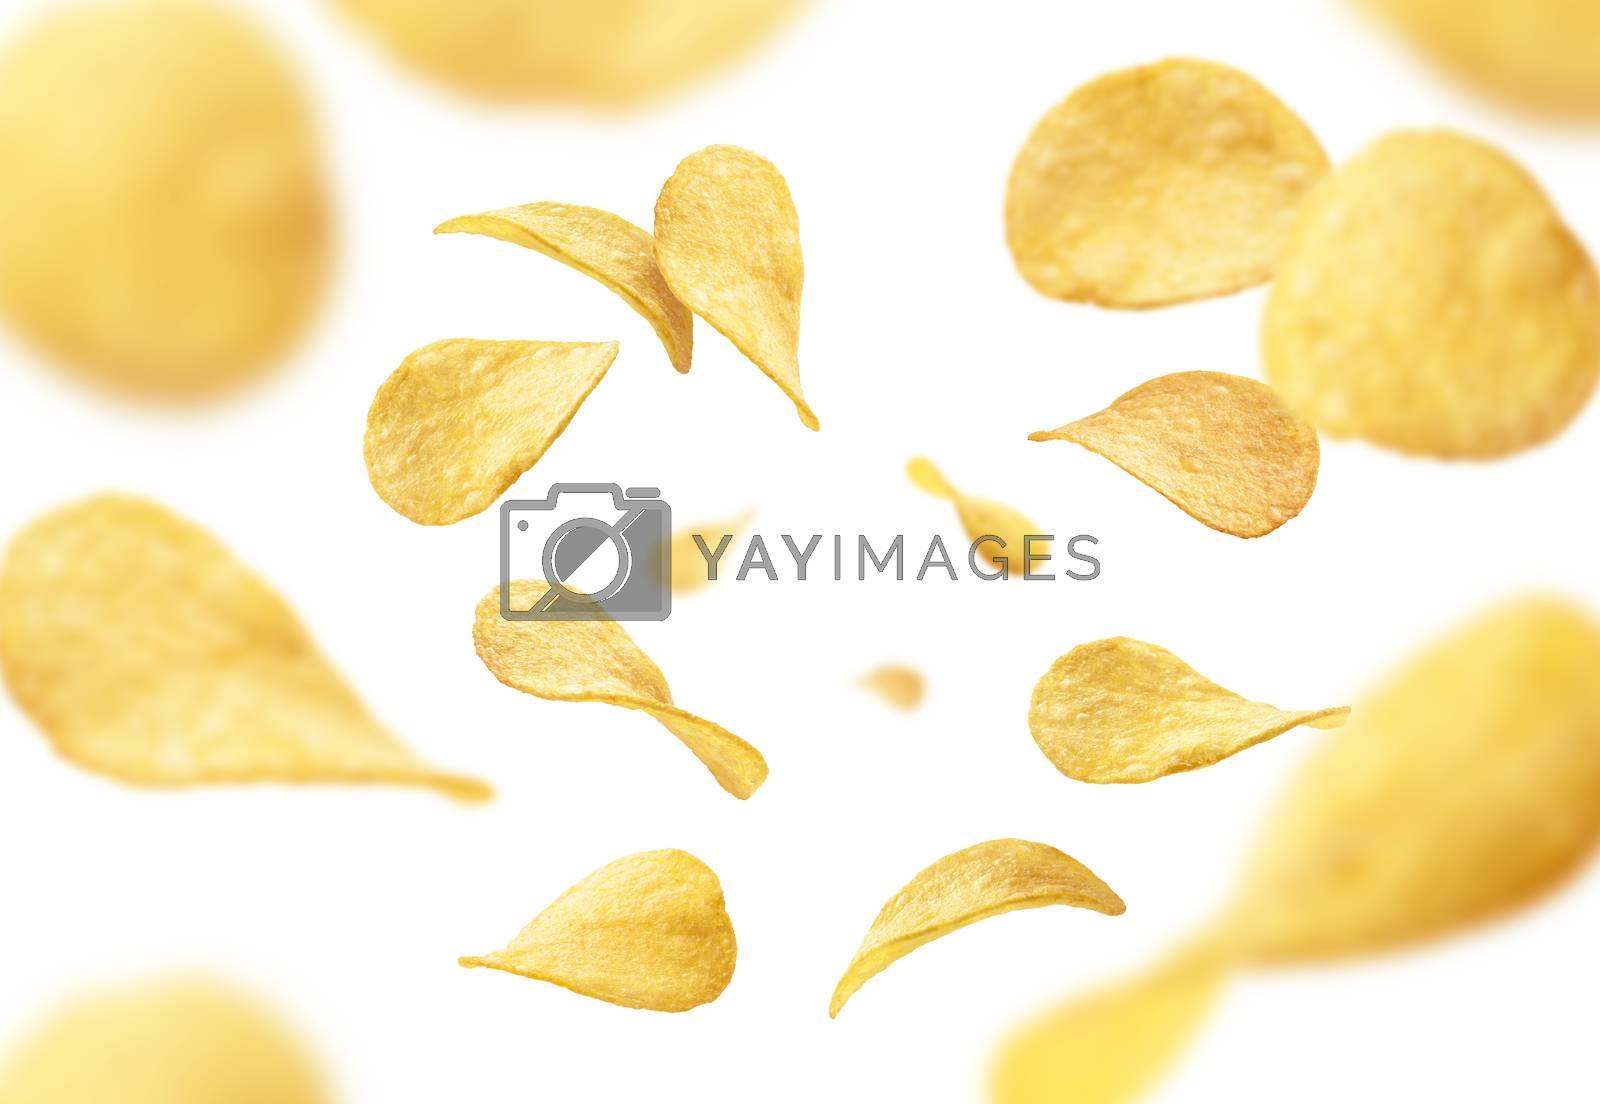 Potato chips levitate on a white background.